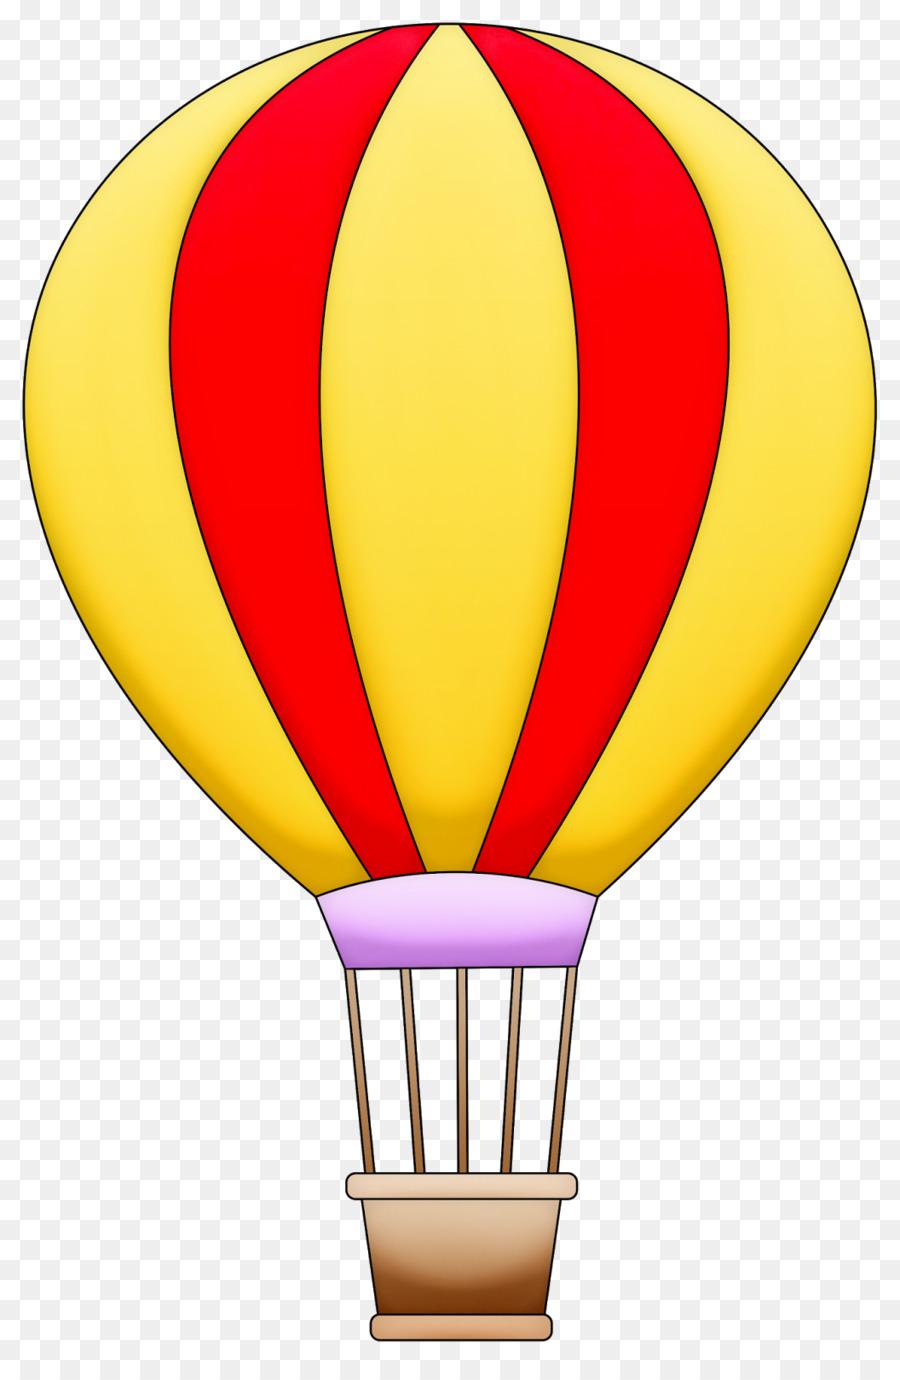 Balon Udara Kartun Png : balon, udara, kartun, Balloon, Download, 1056*1600, Transparent, Download., CleanPNG, KissPNG